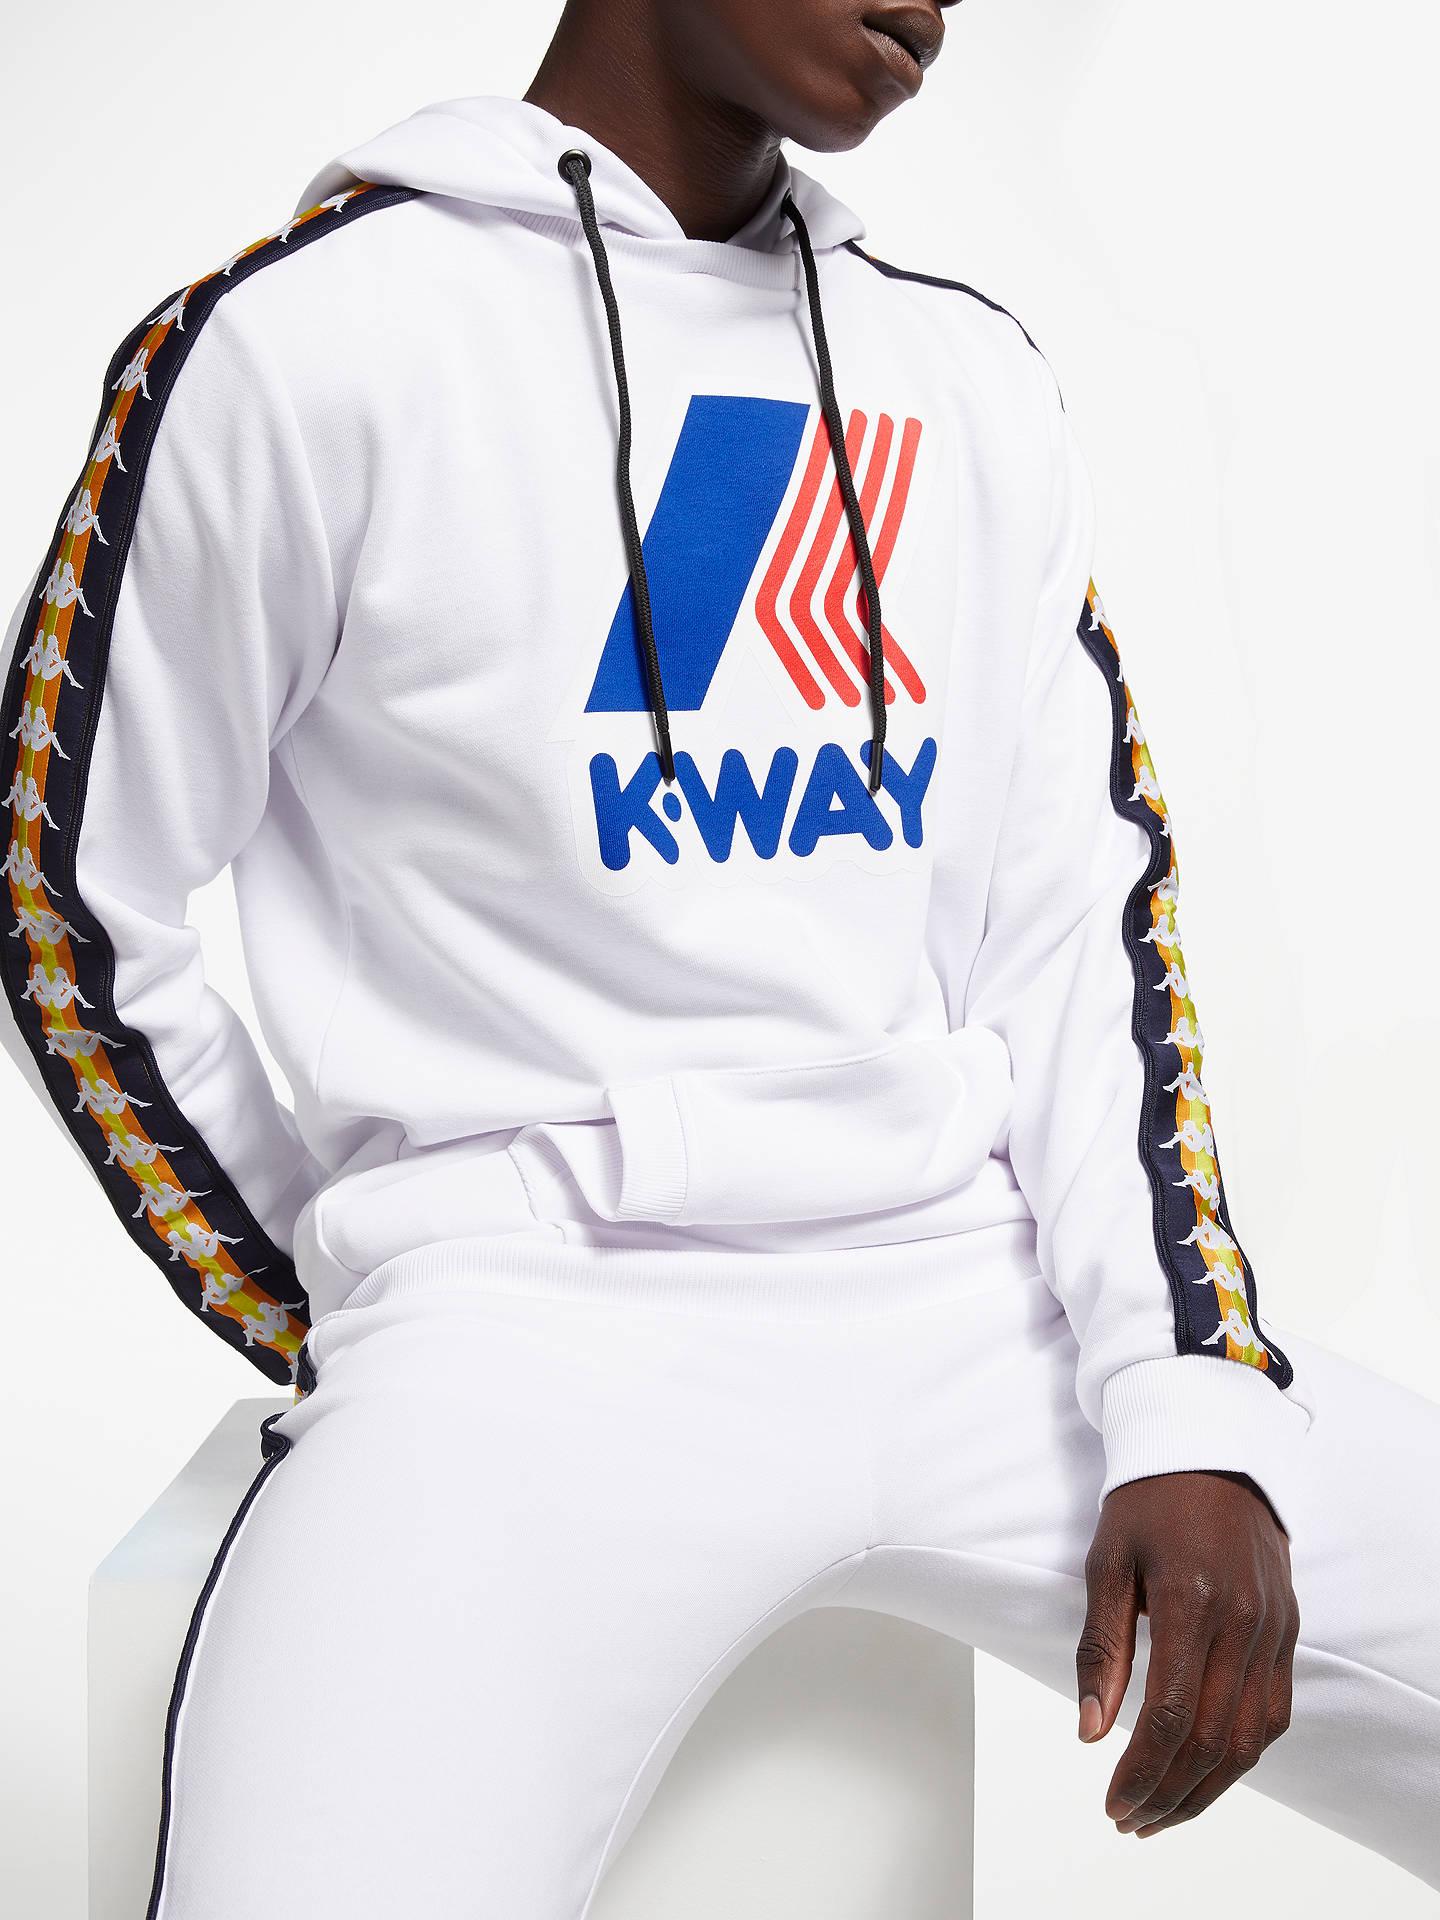 b6ca4d2ed0 K-Way x Kappa Hoodie, White at John Lewis & Partners